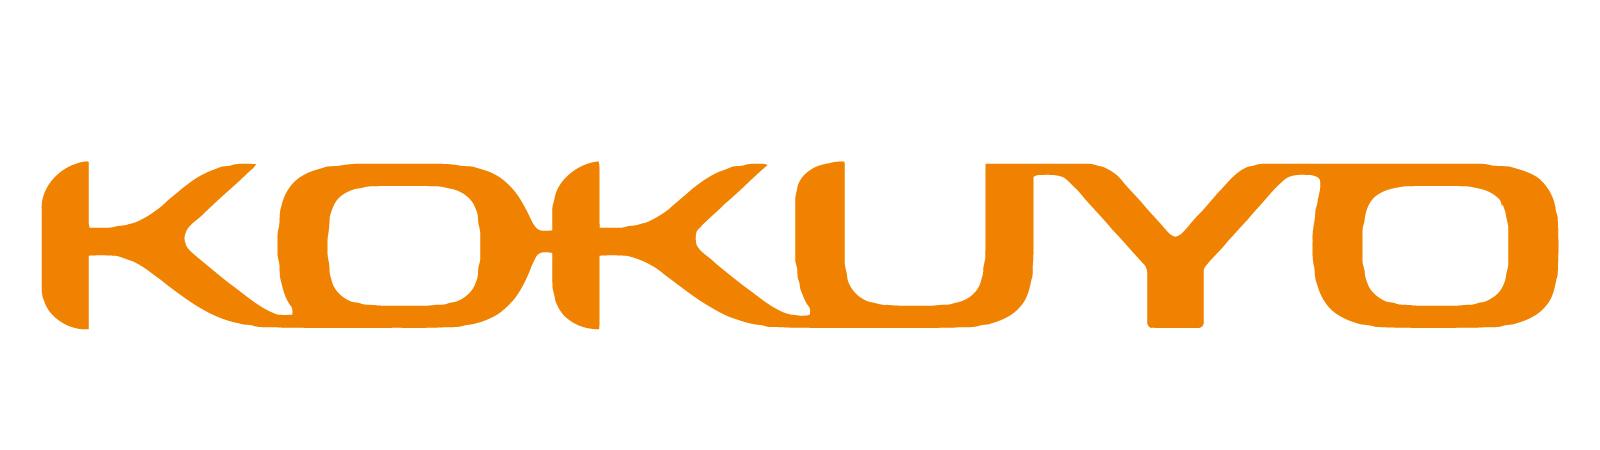 Kokuyo - Japan